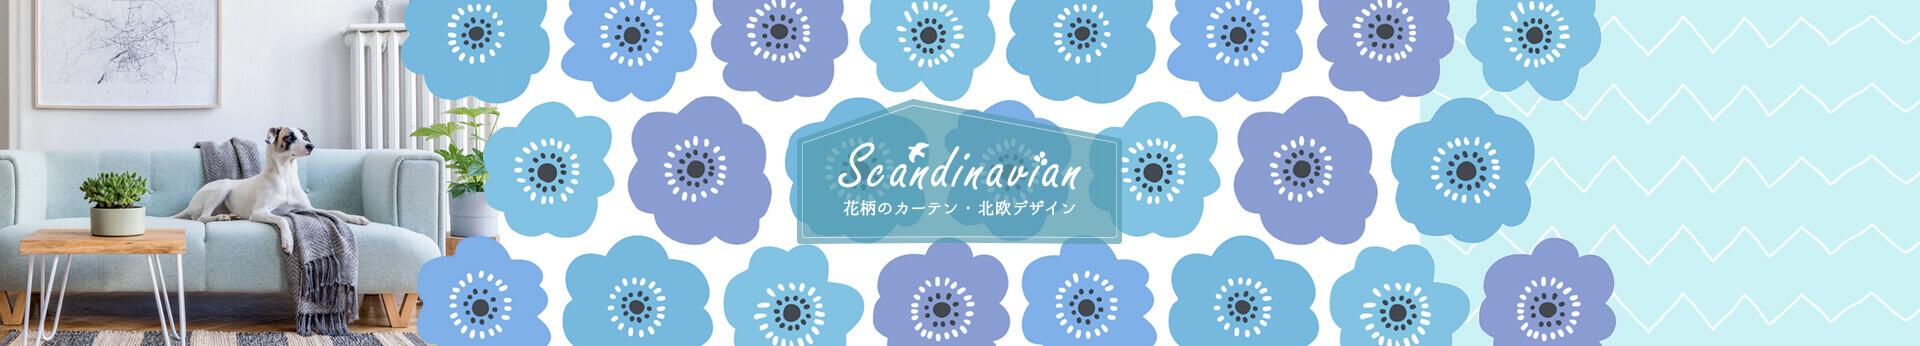 SCANDINAVIAN 花柄のカーテン・北欧デザイン